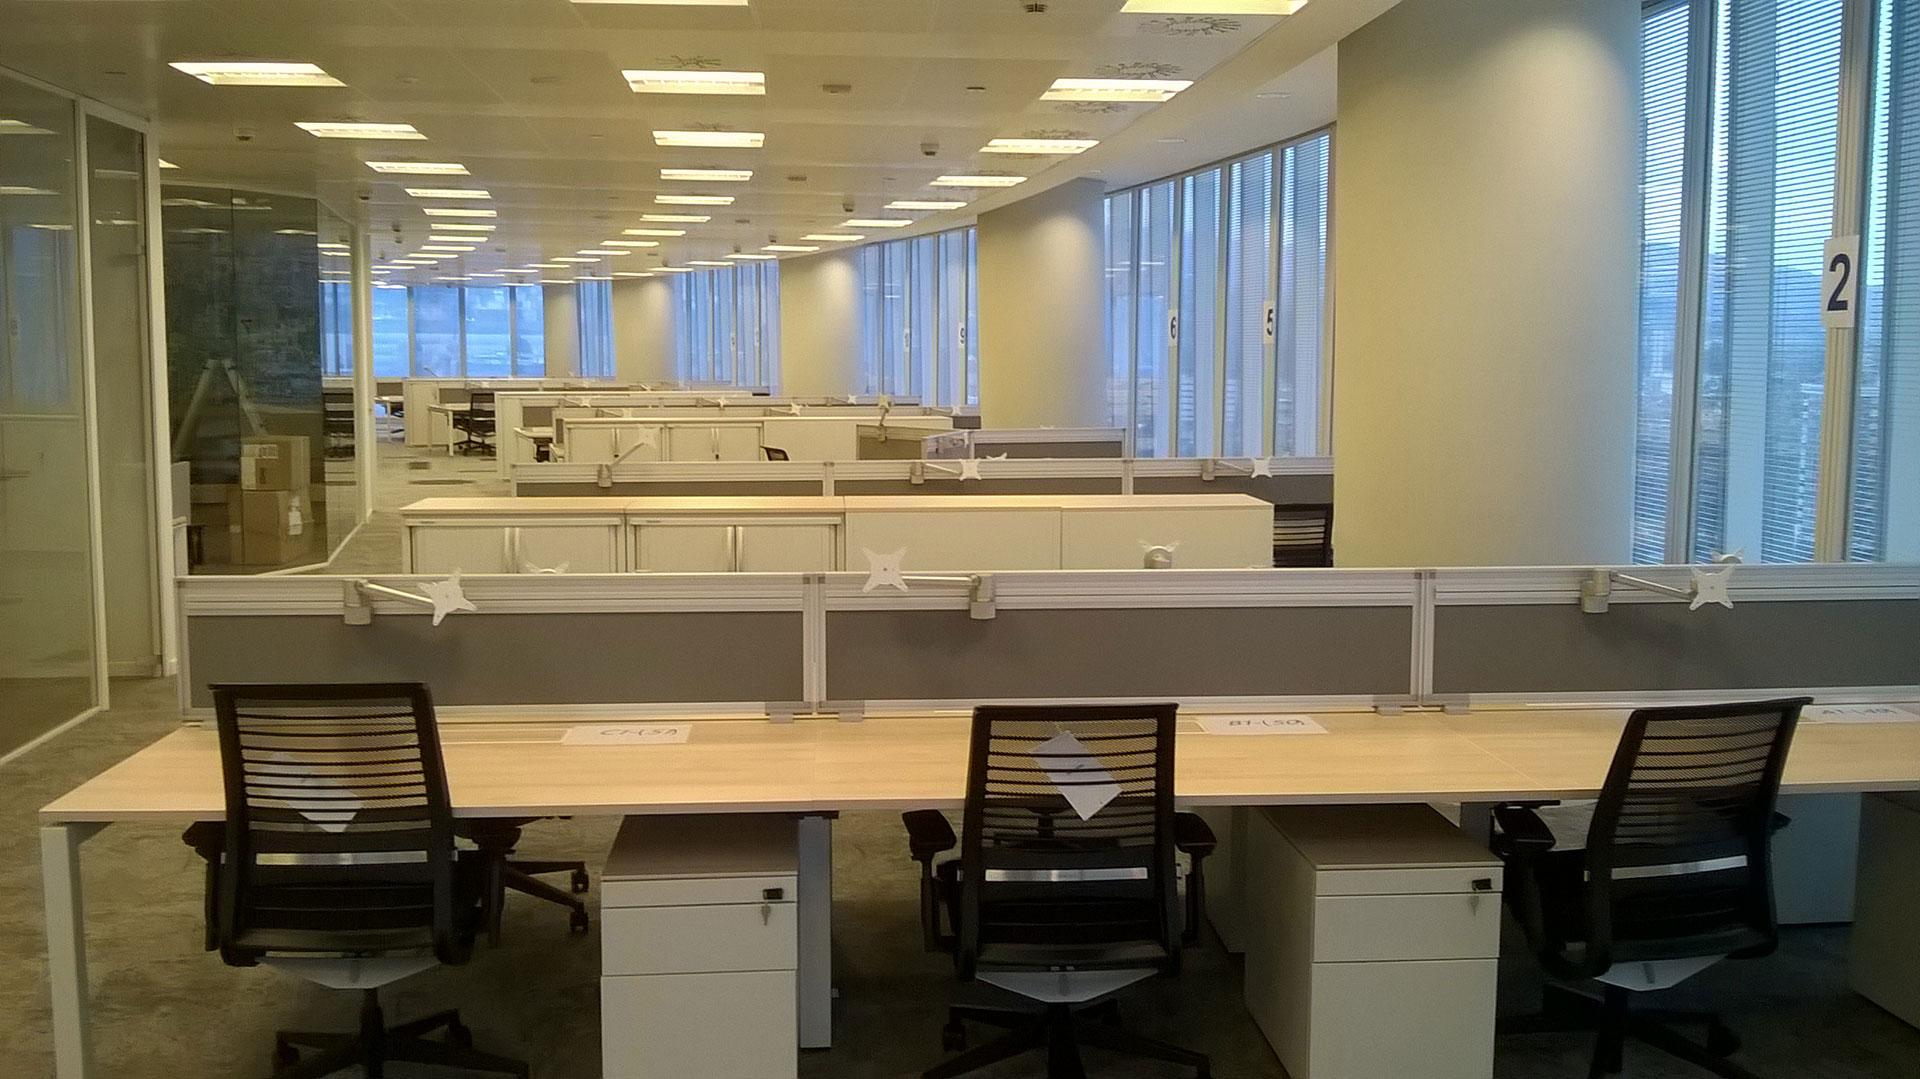 Willis torre iberdrola bilbao oficinas construcci n for Oficina iberdrola